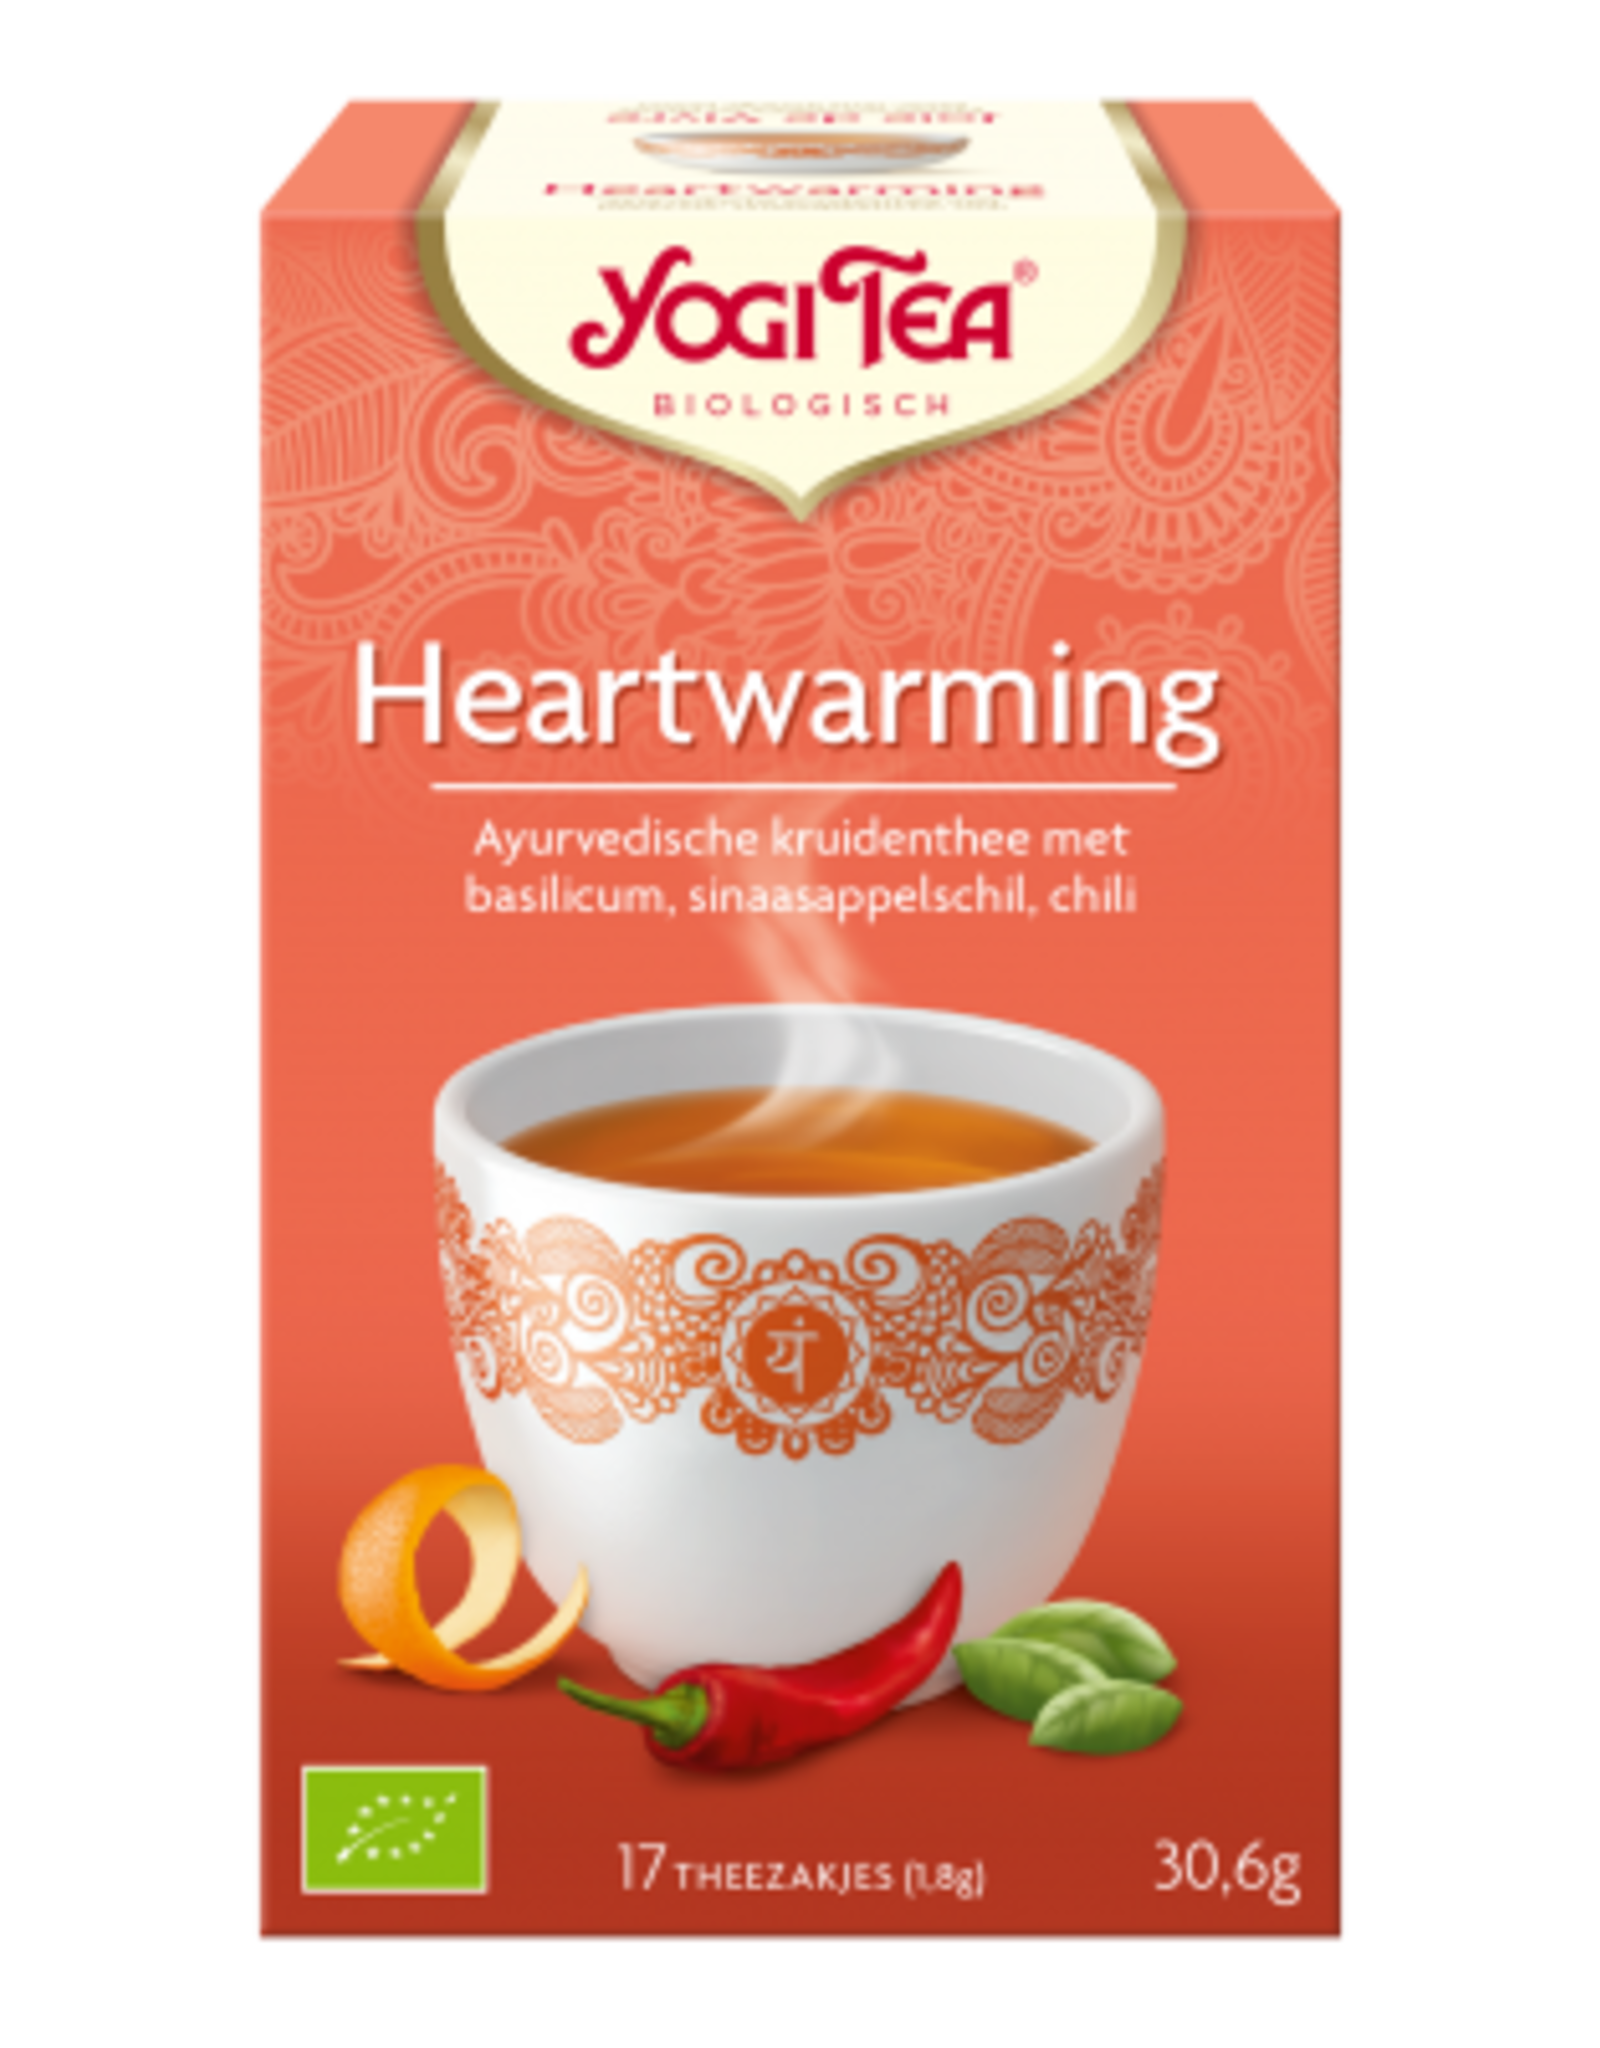 Yogi Tea Yogi Tea Heartwarming